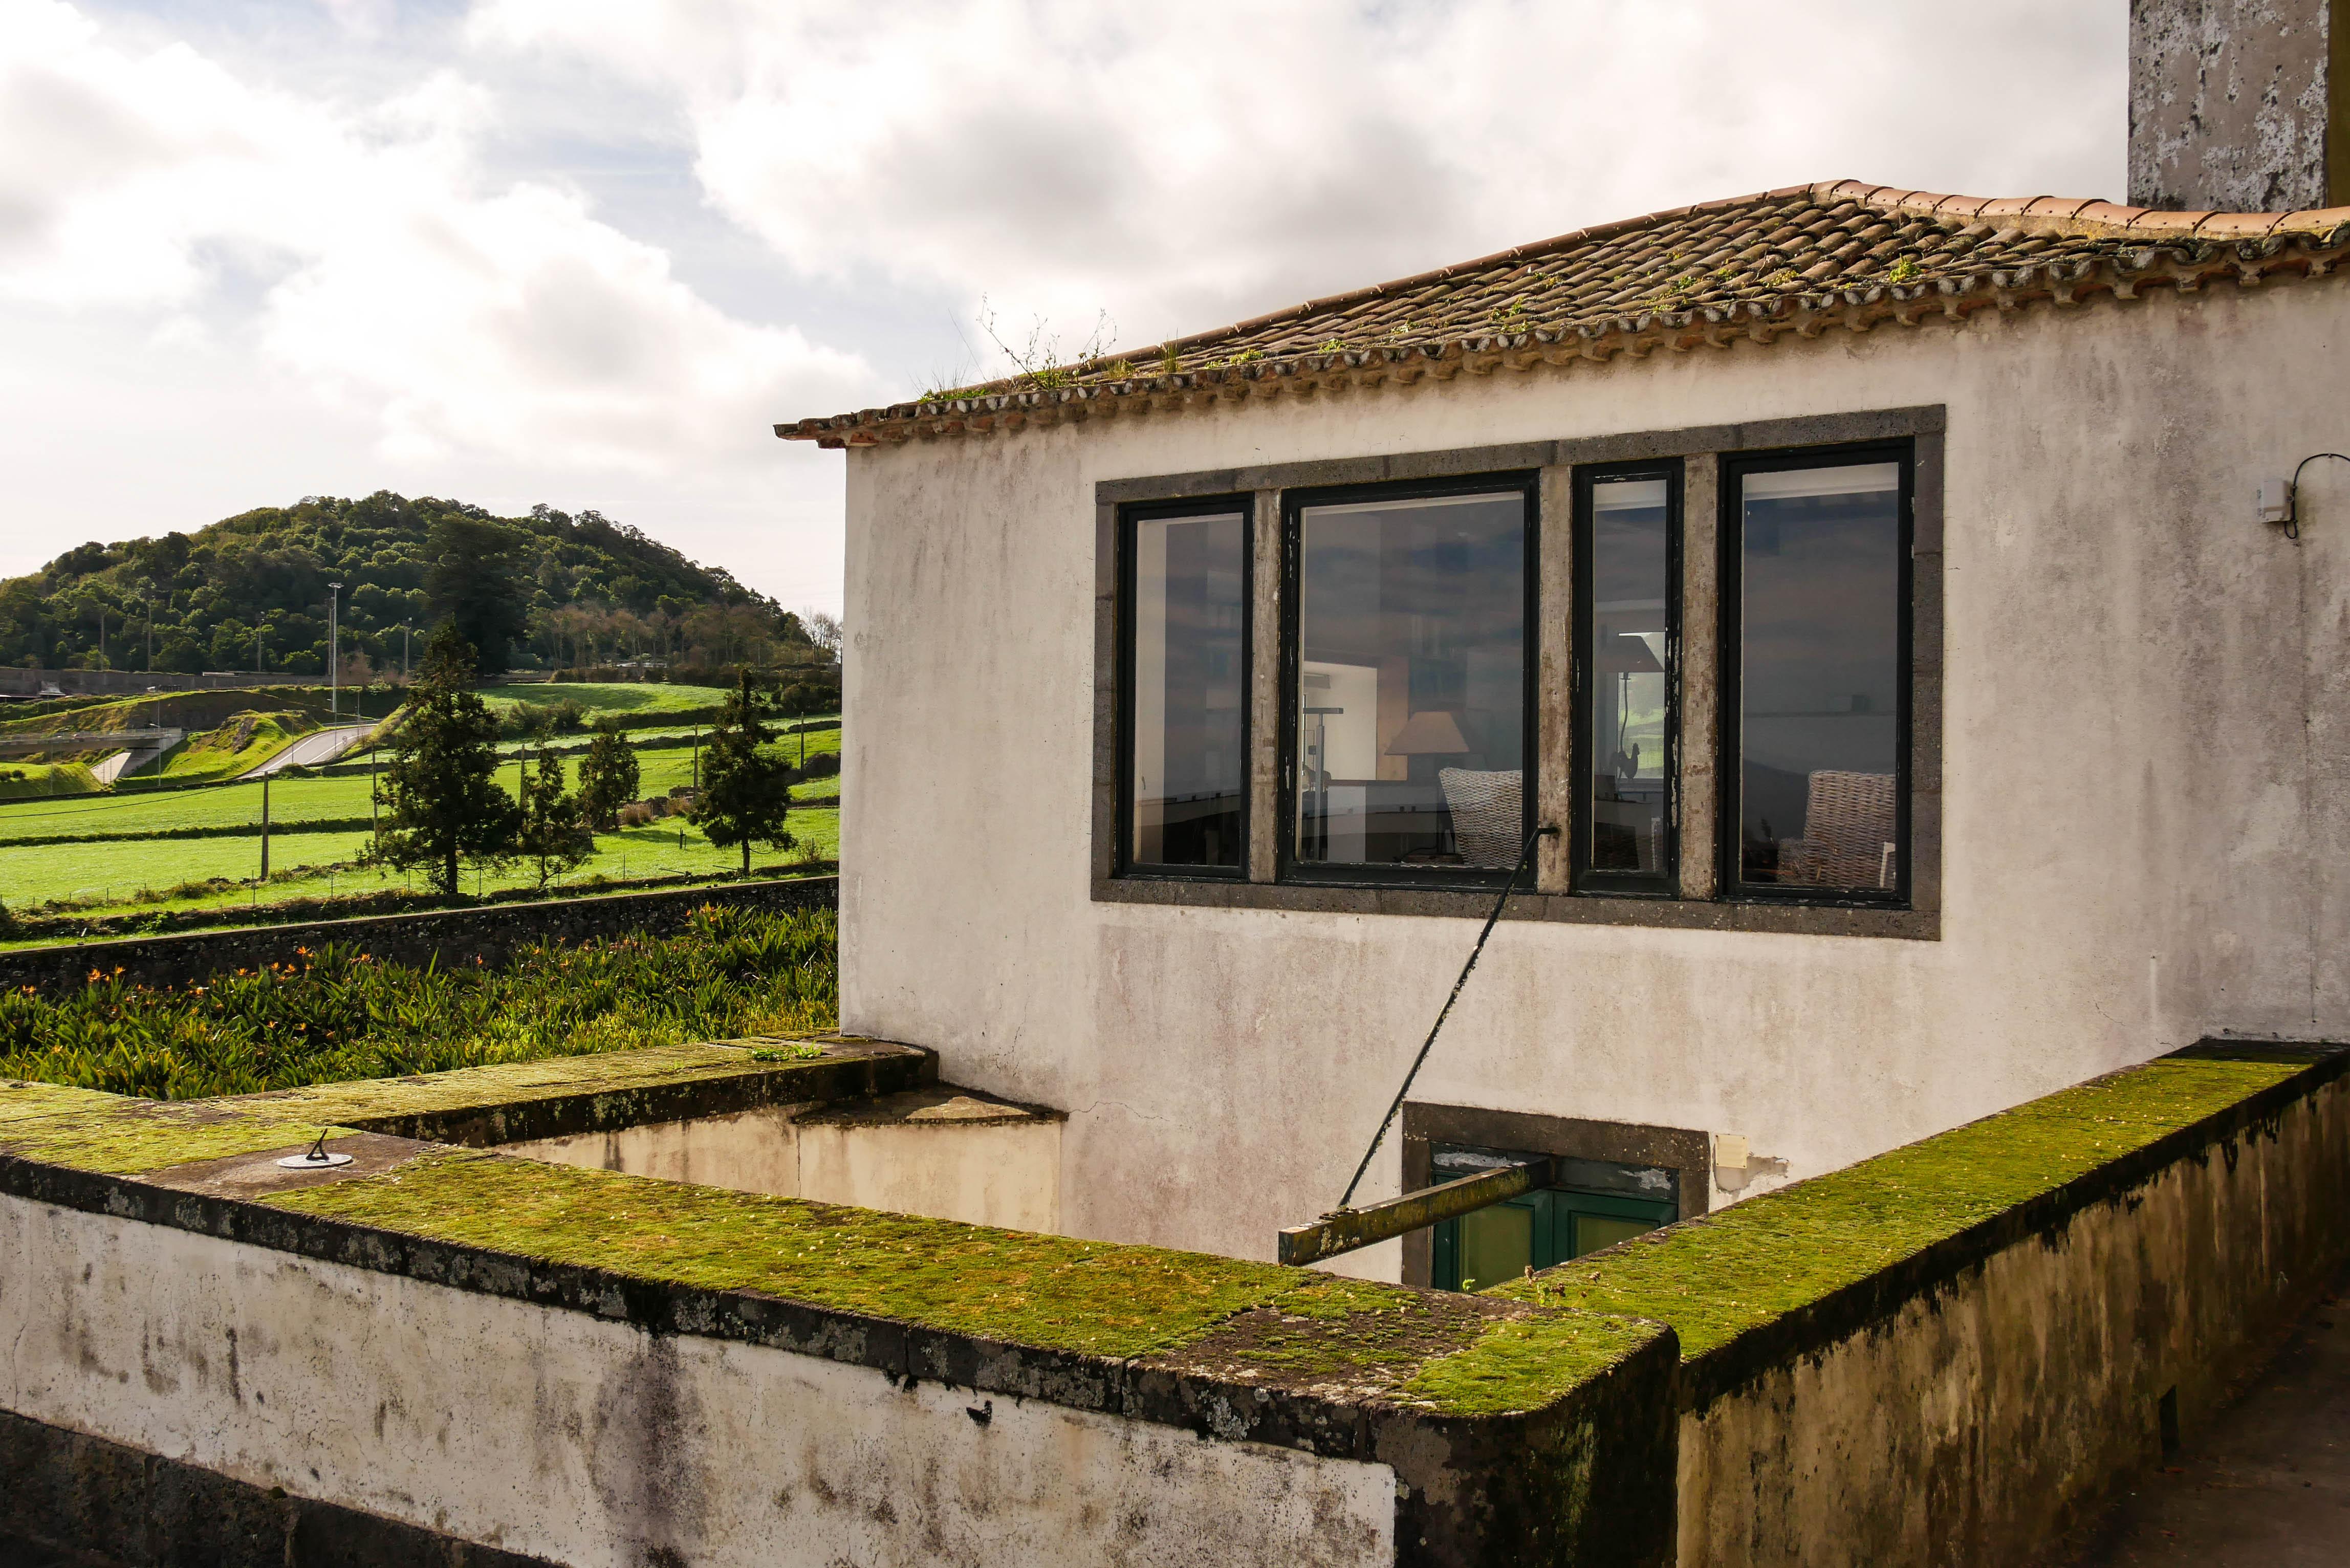 Airbnb Ferienhaus, São Miguel